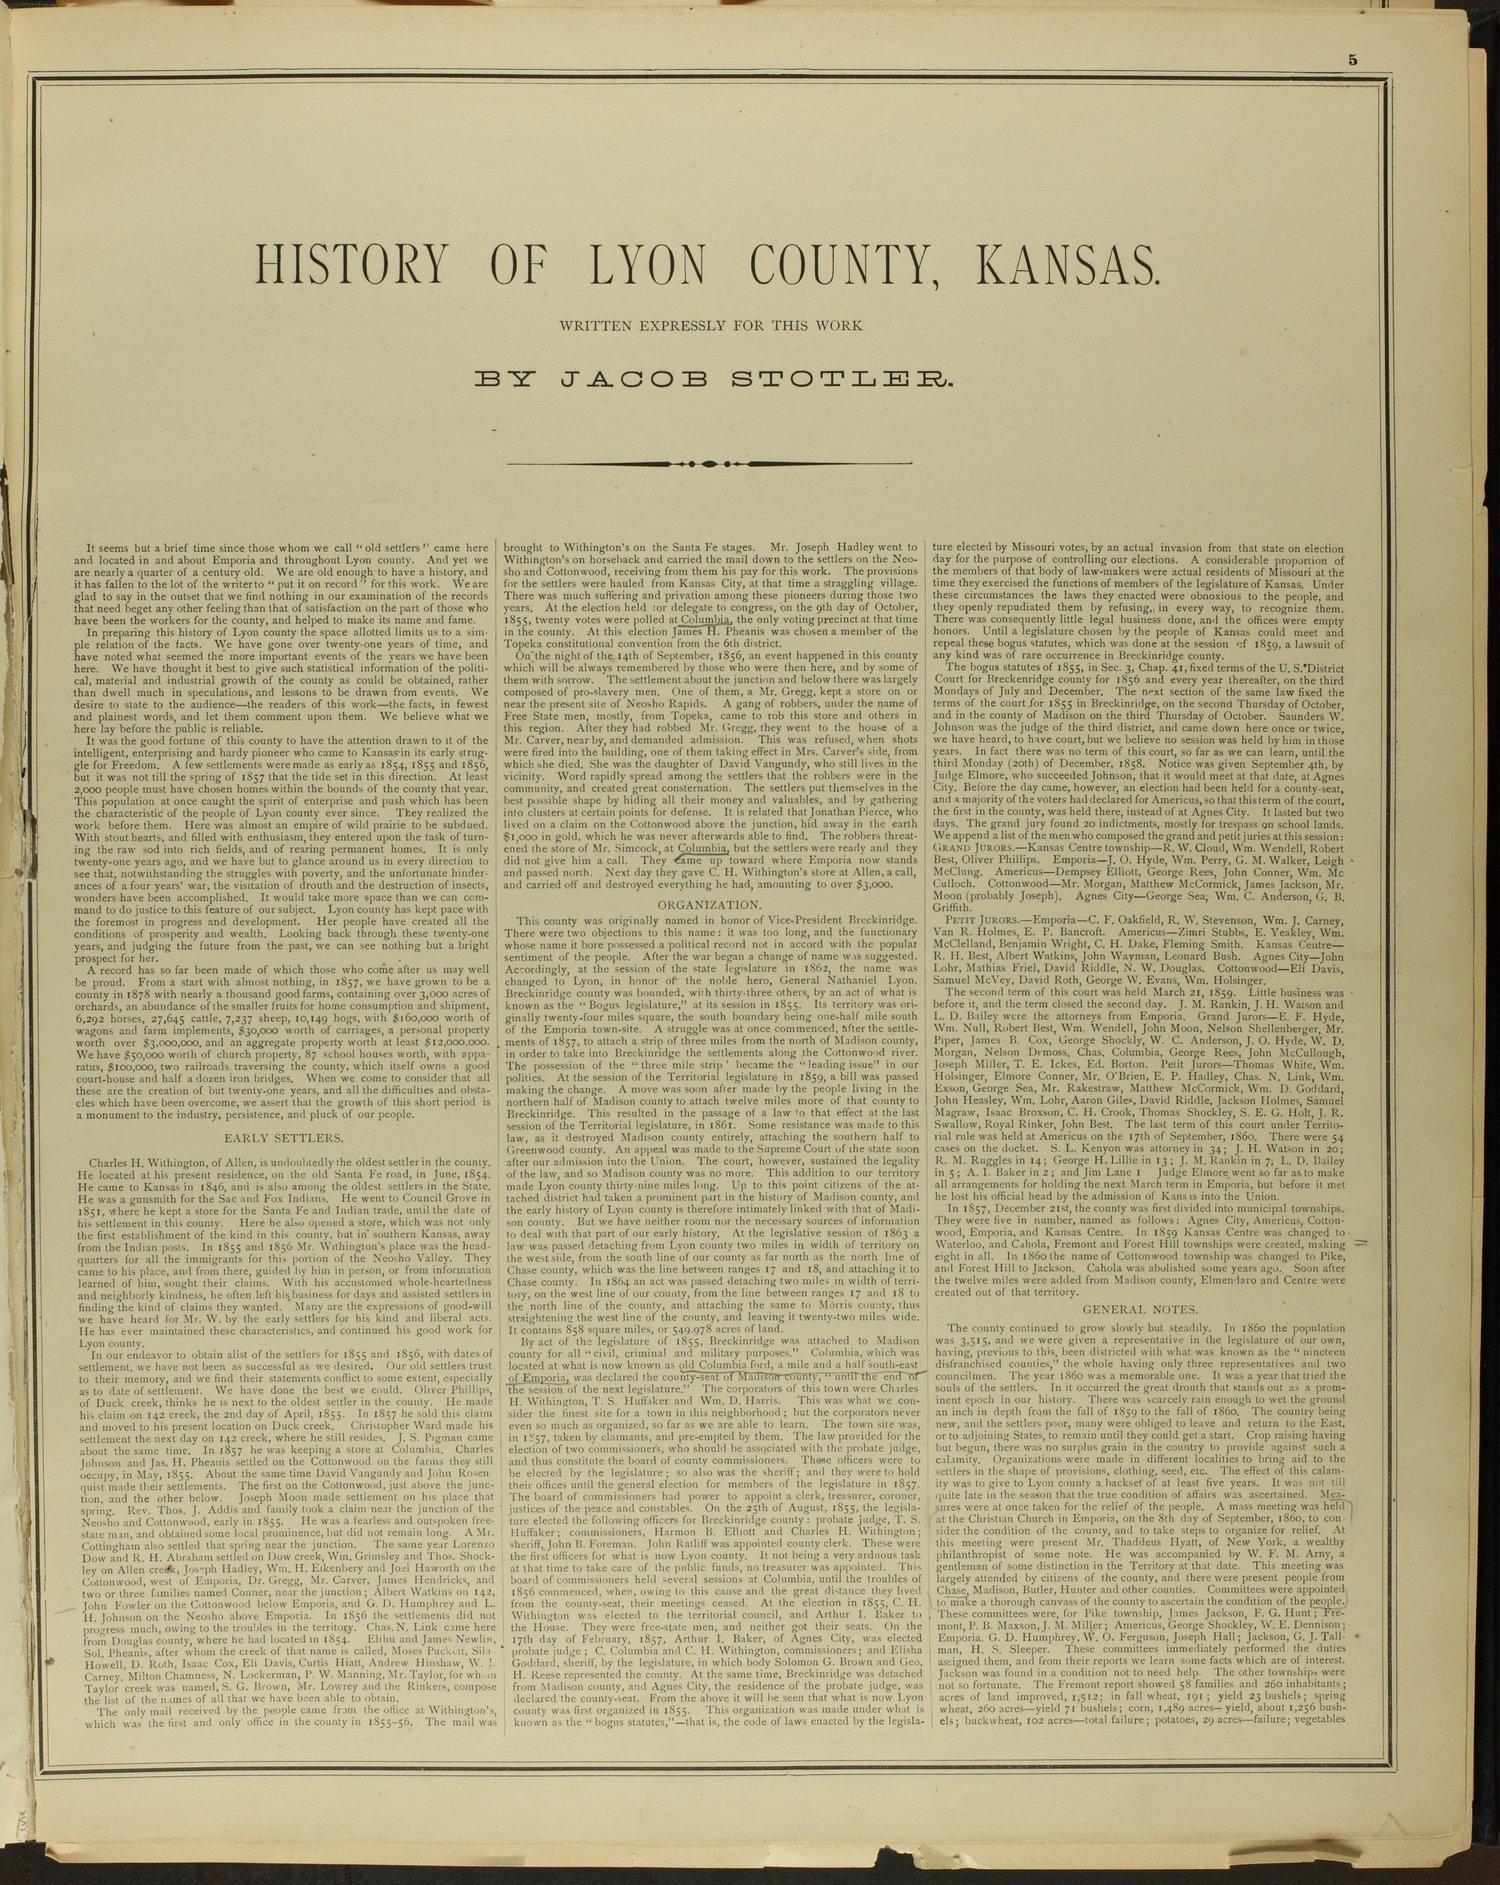 An illustrated historical atlas of Lyon county, Kansas - 5